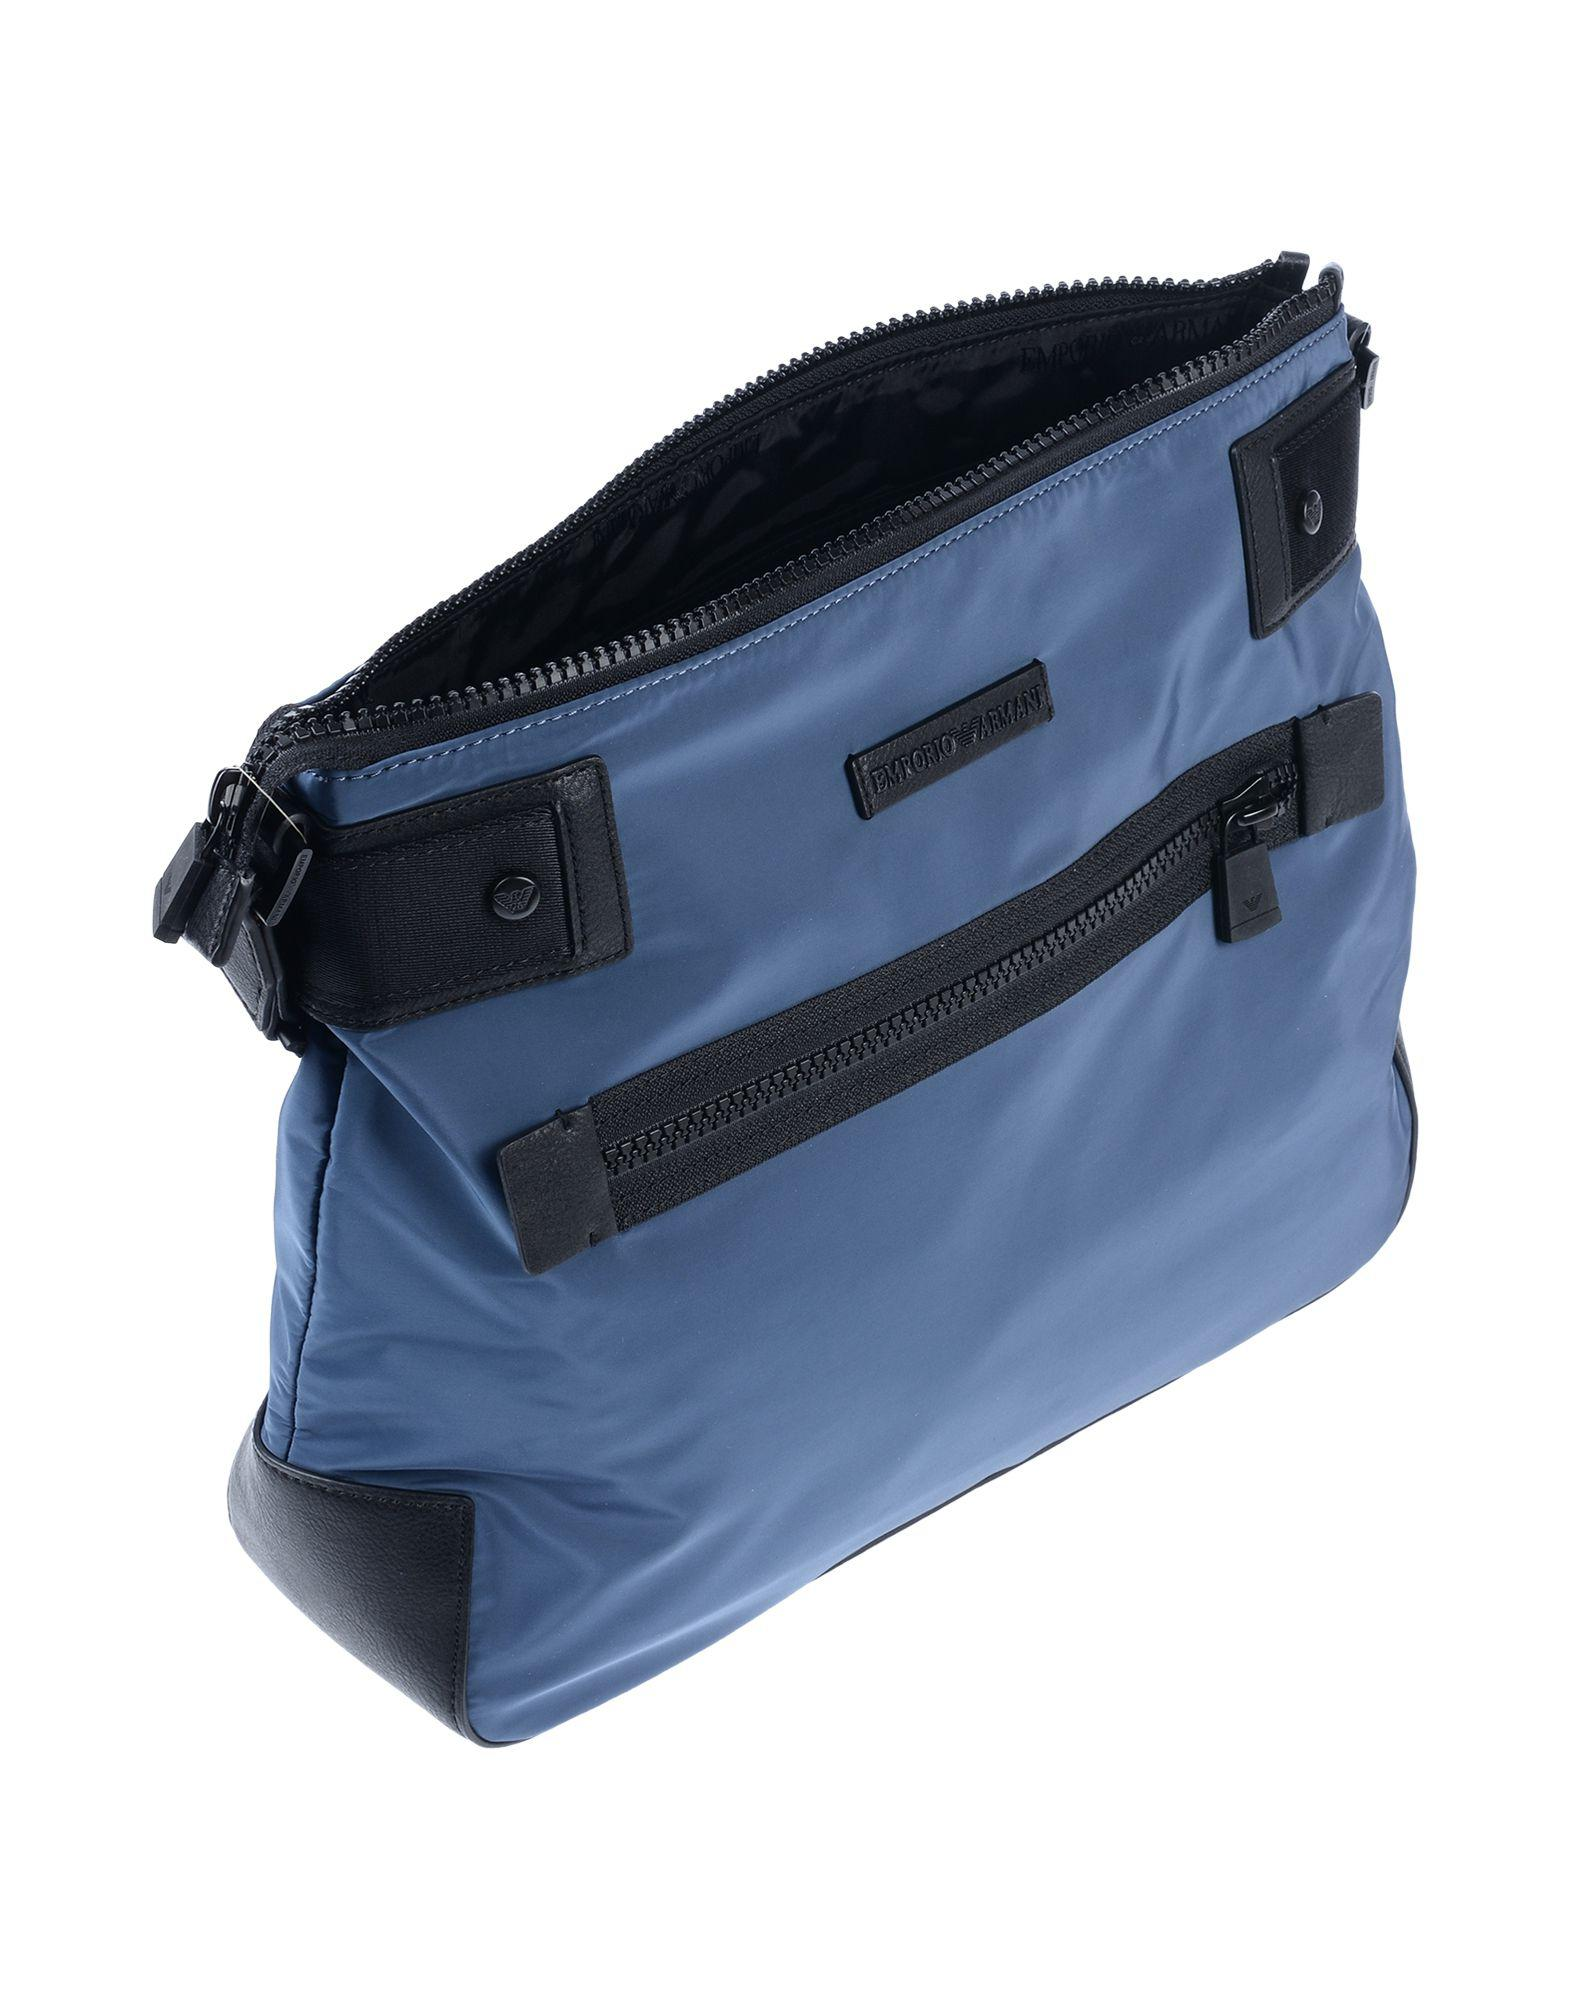 Lyst Emporio Armani Logo Strap Messenger Bag In Blue For Men 4312a69330fe8